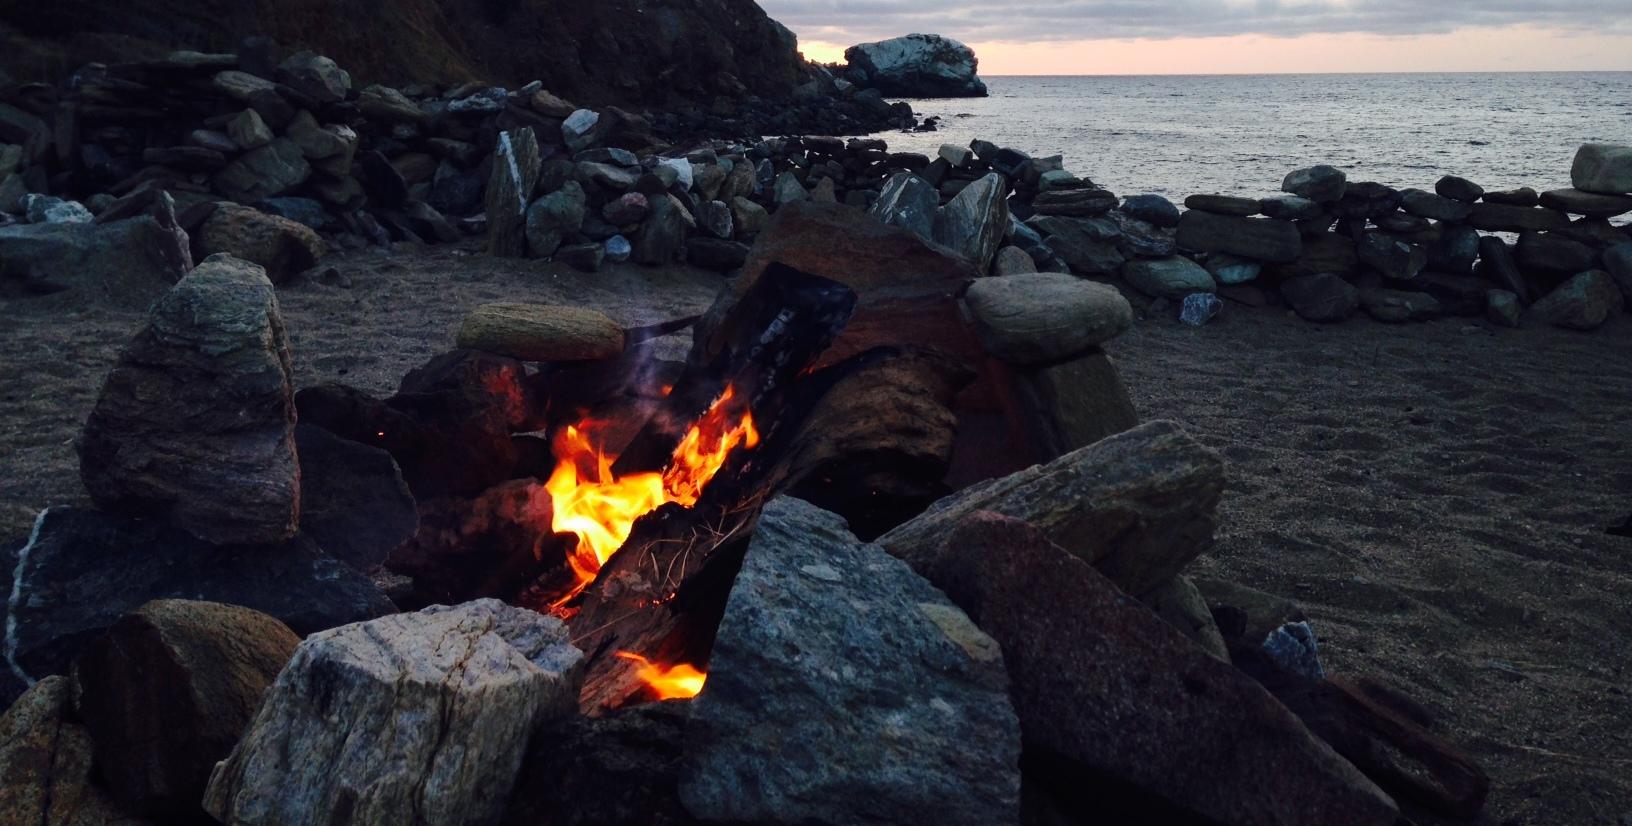 Campfire, Parsons Landing, Catalina Island, CA